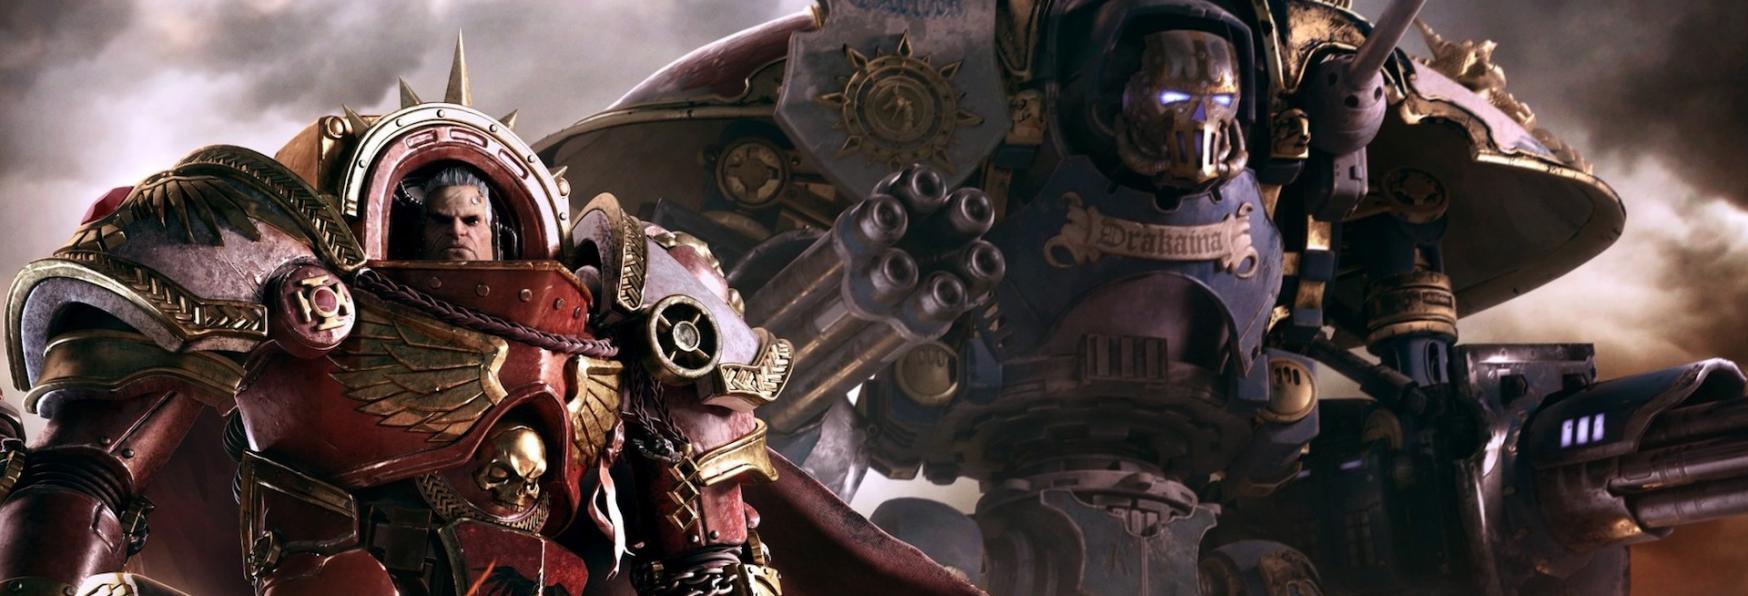 Warhammer 40.000: in Sviluppo una nuova Serie TV Antologica